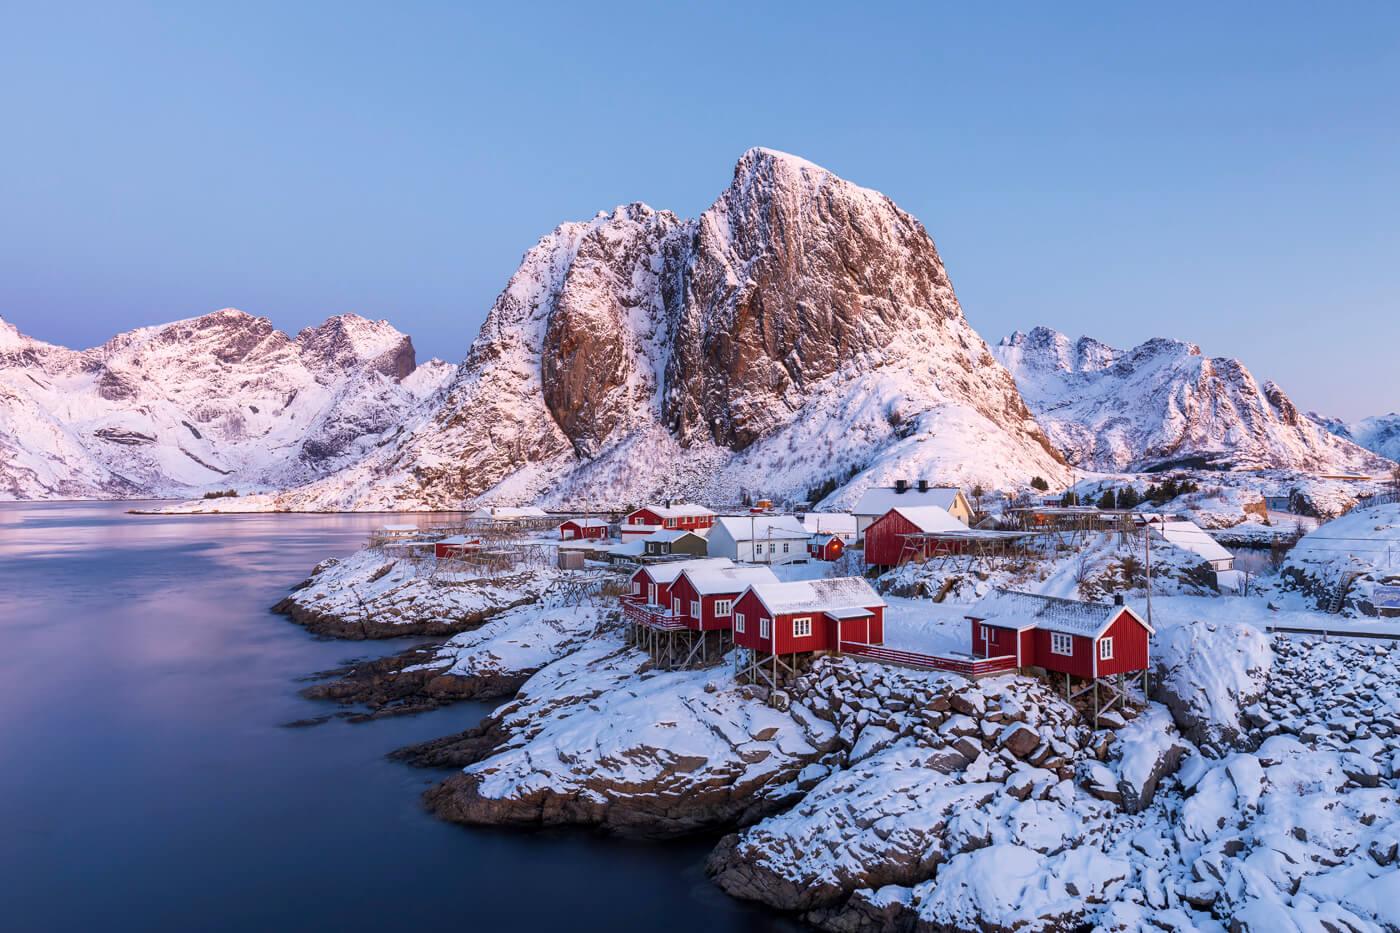 Lofoten photography workshop in Norway